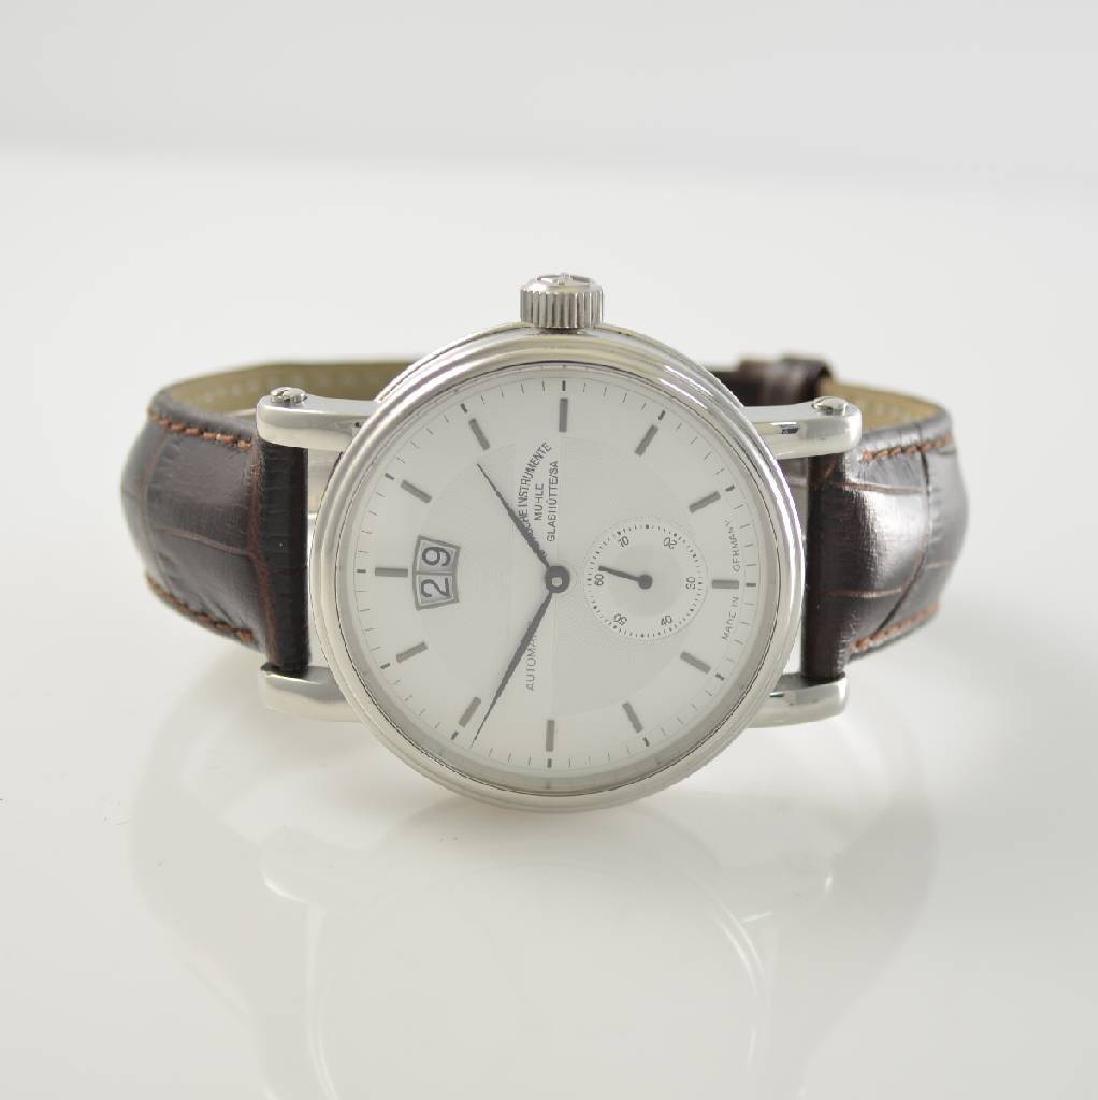 MUHLE GLASHUTTE gents wristwatch Teutonia